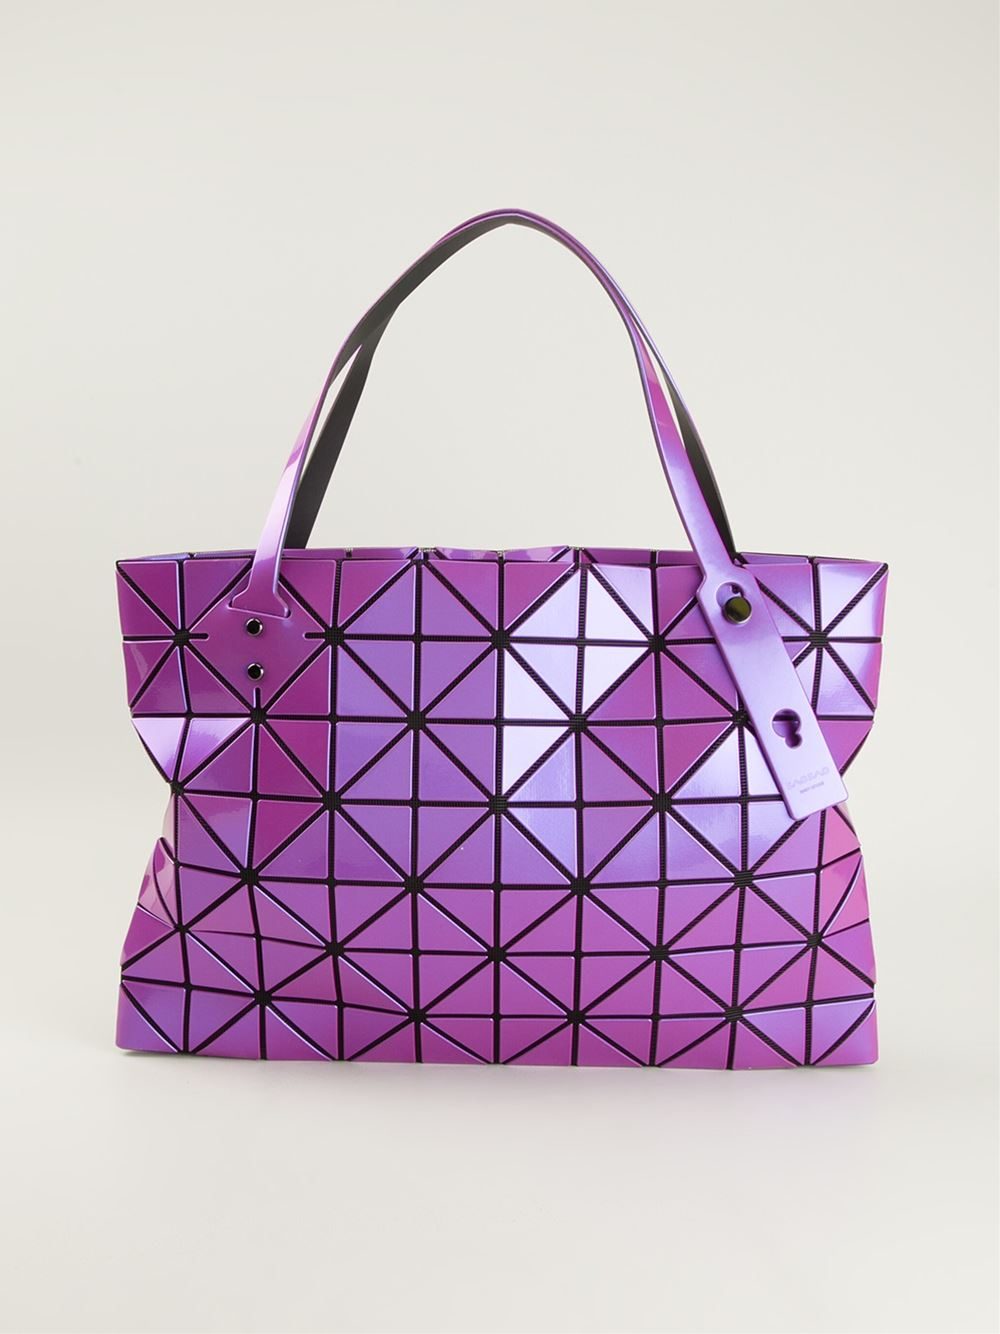 prism crossbody bag - Pink & Purple Bao Bao Issey Miyake QrYIoTj